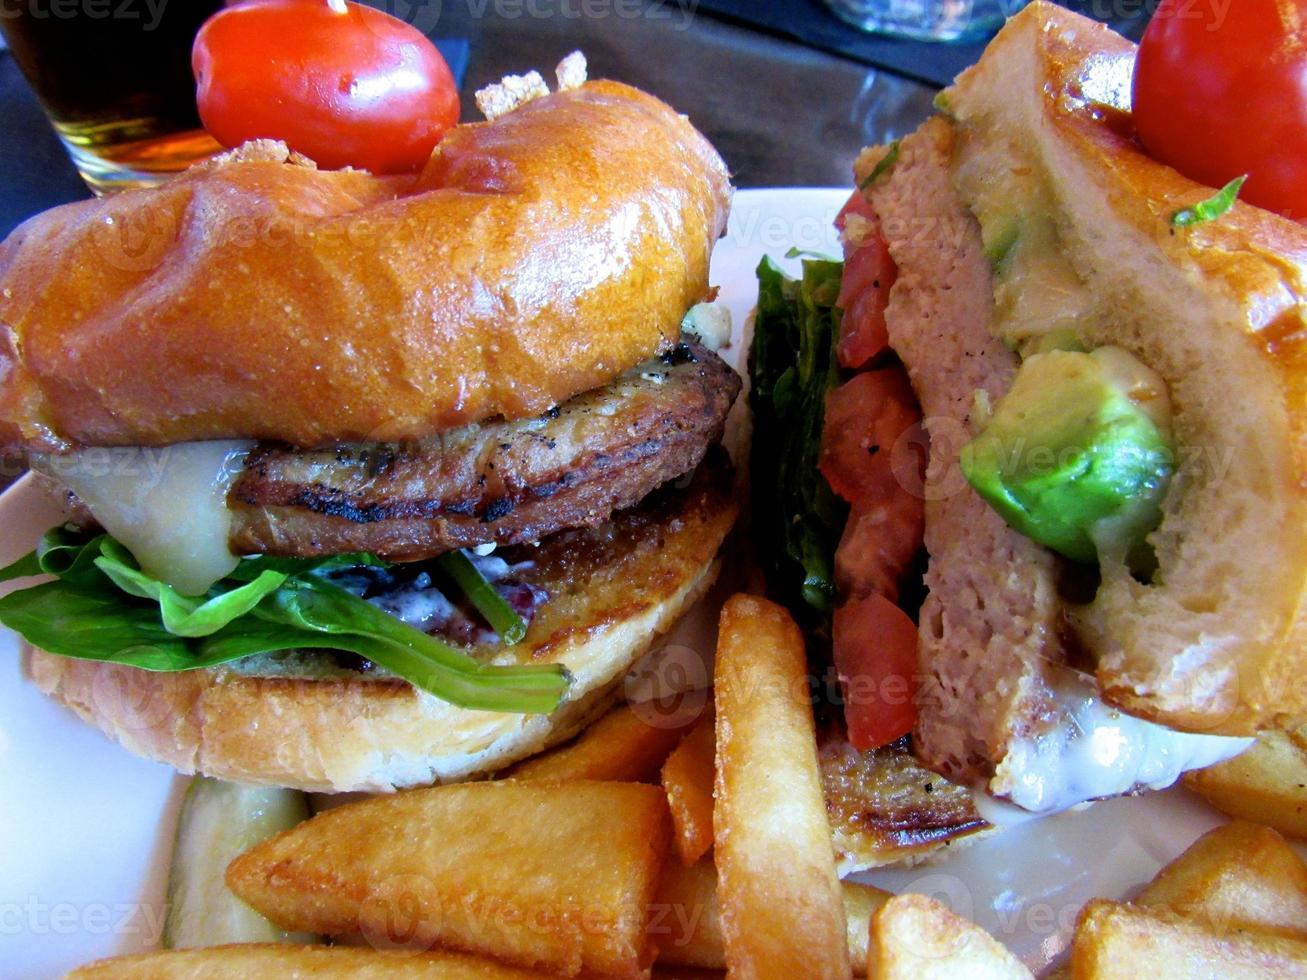 hamburger da vicino foto